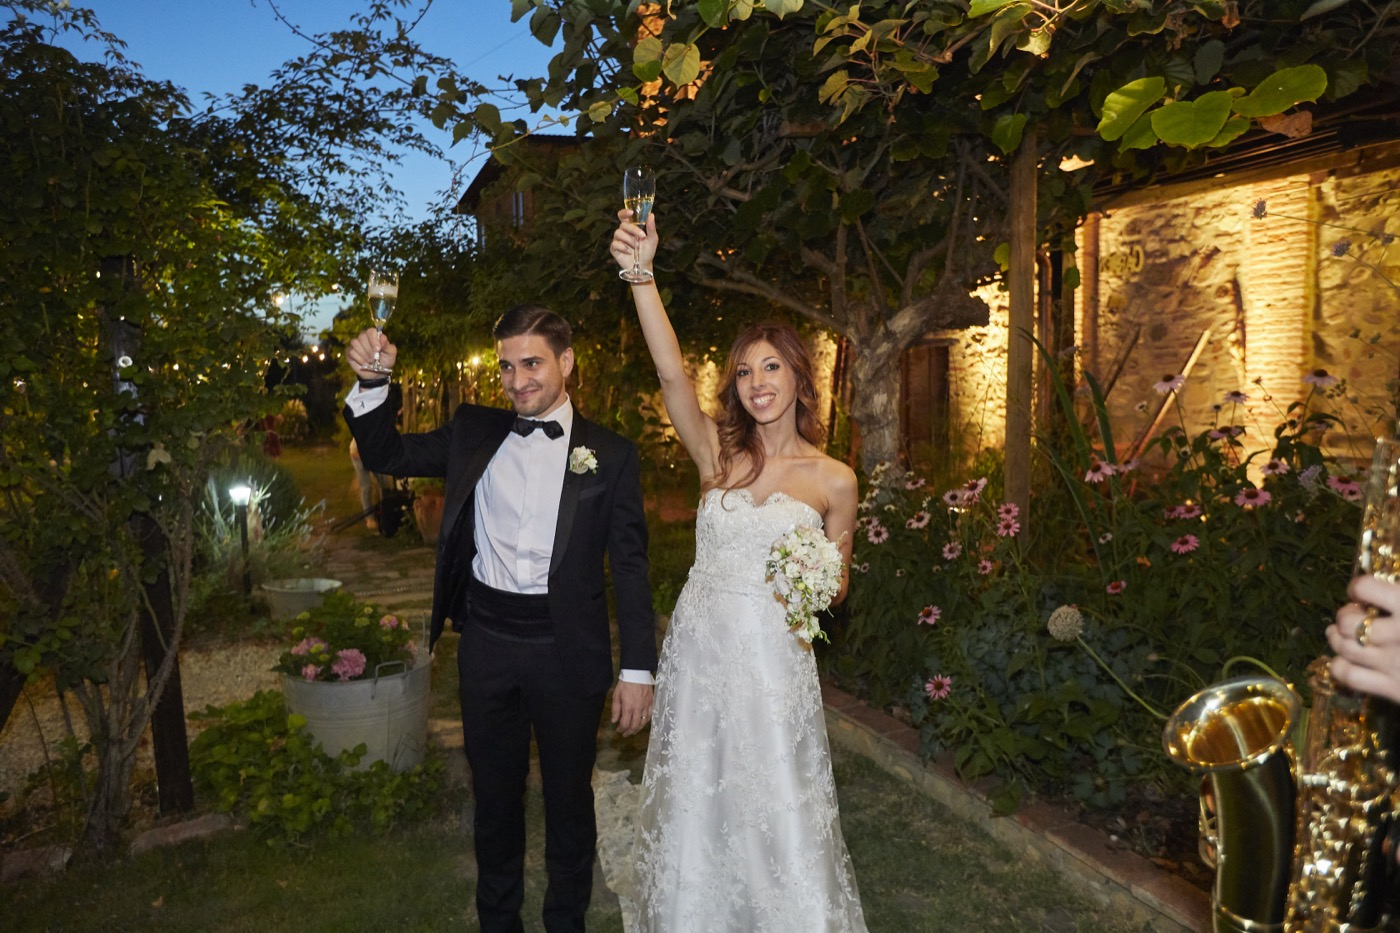 Claudio-Coppola-wedding-photographer-abbazia-7-frati-piegaro-85